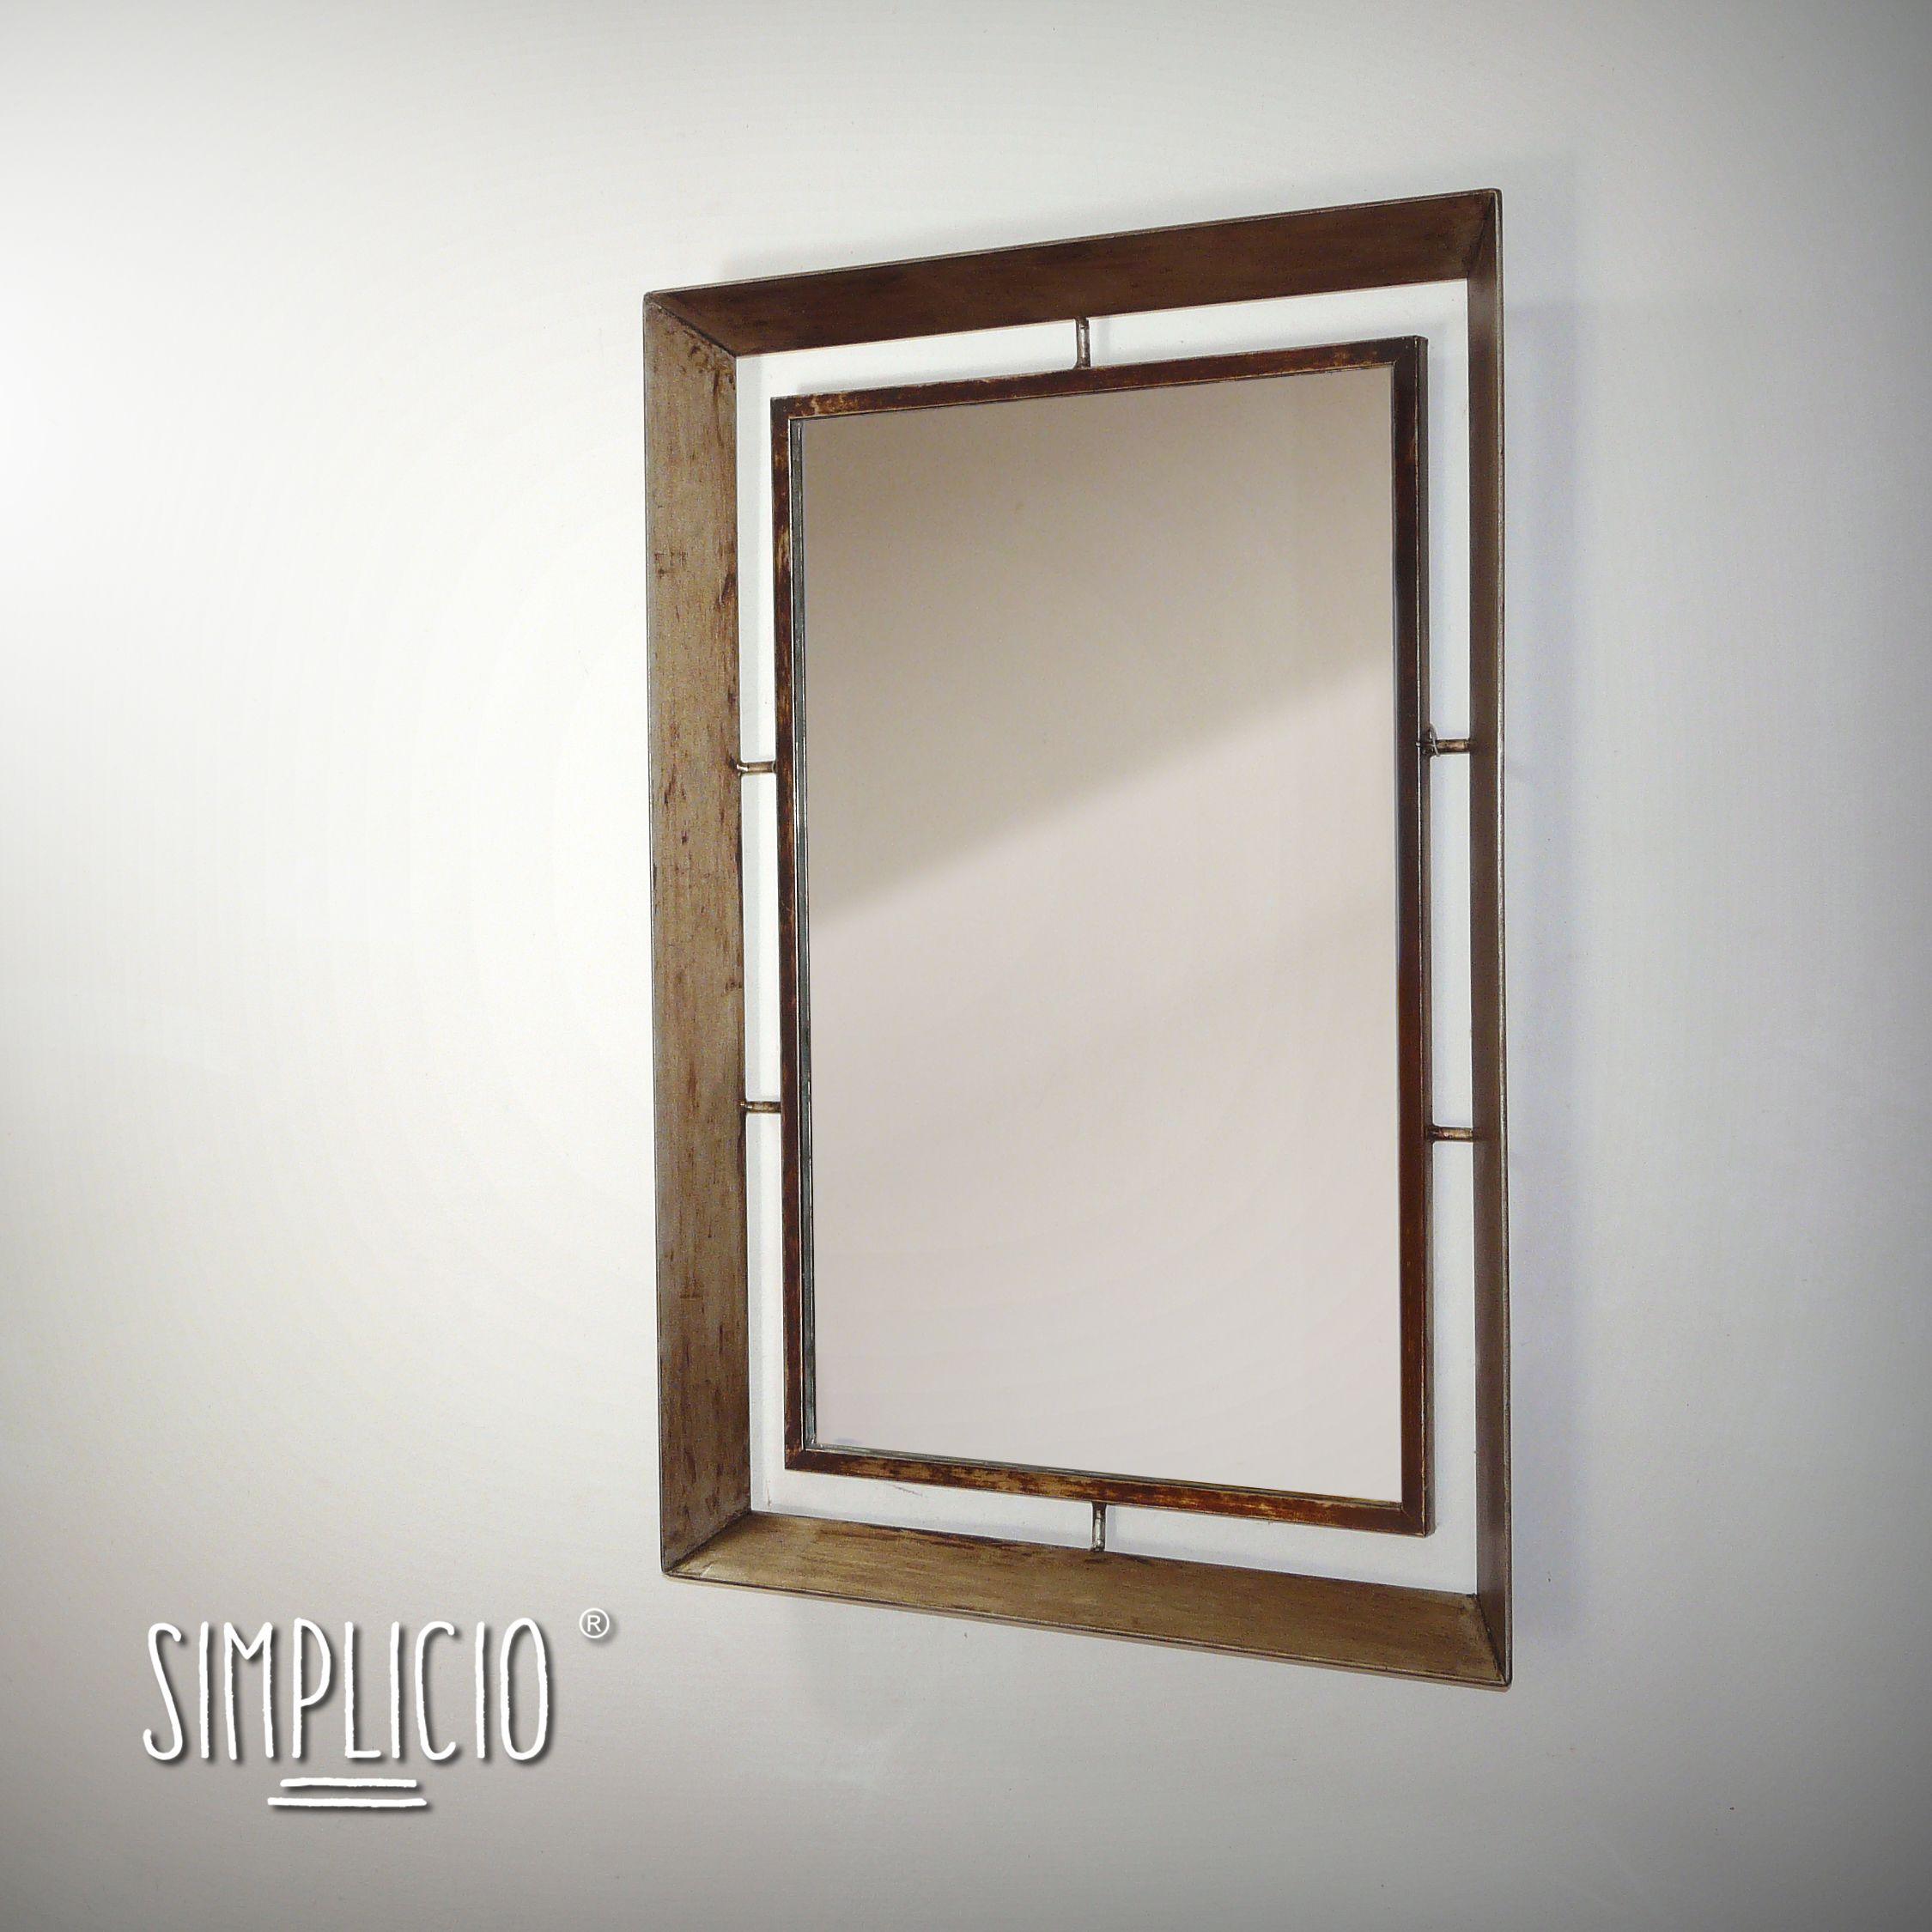 simplicio espejo marco doble mirror dual frame 70x50cm - Dual Picture Frame